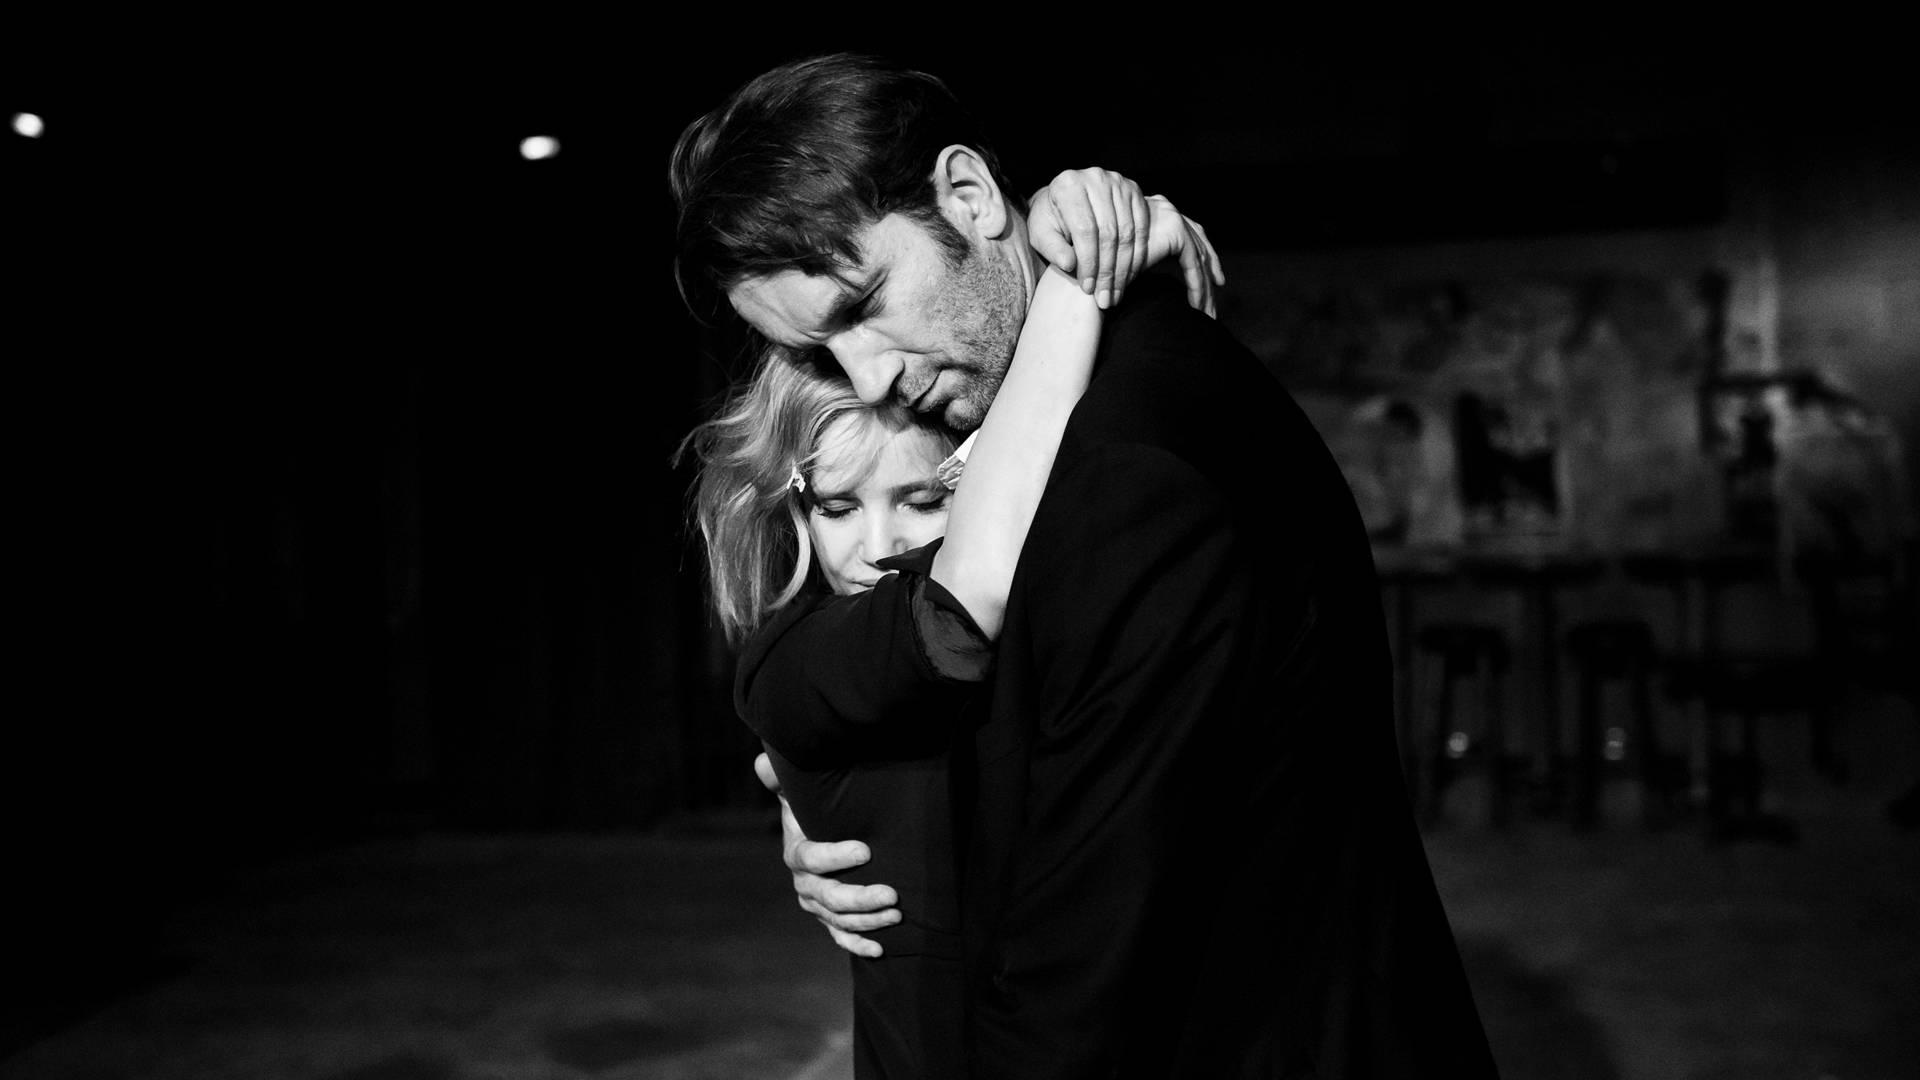 Joanna Kulig as Zula and Tomasz Kot as Wiktor in Paweł Pawlikowski's 'Cold War.' Amazon Studios